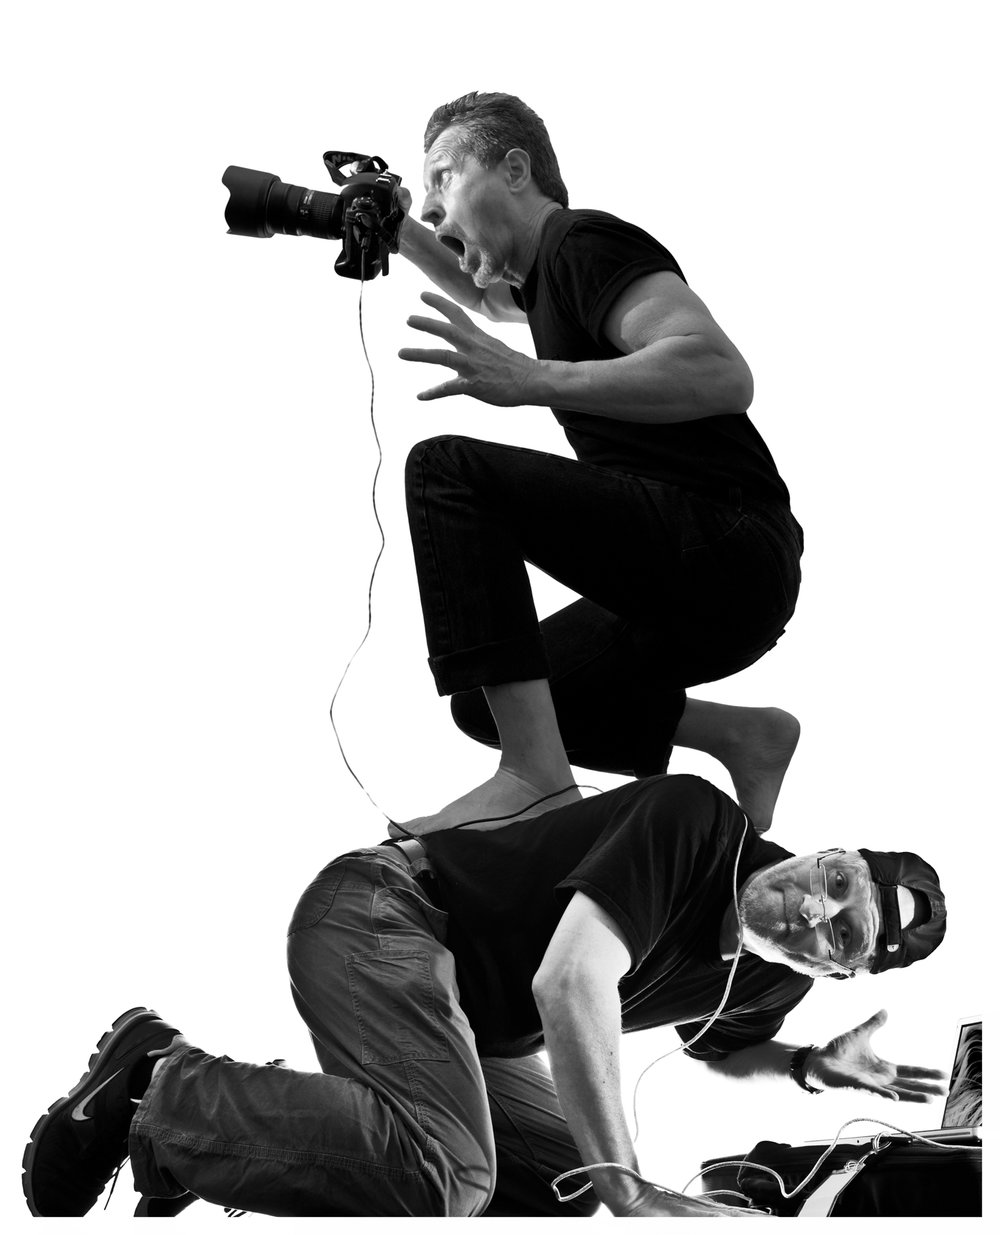 photographers Rob Van Petten and Randall Armor   2010